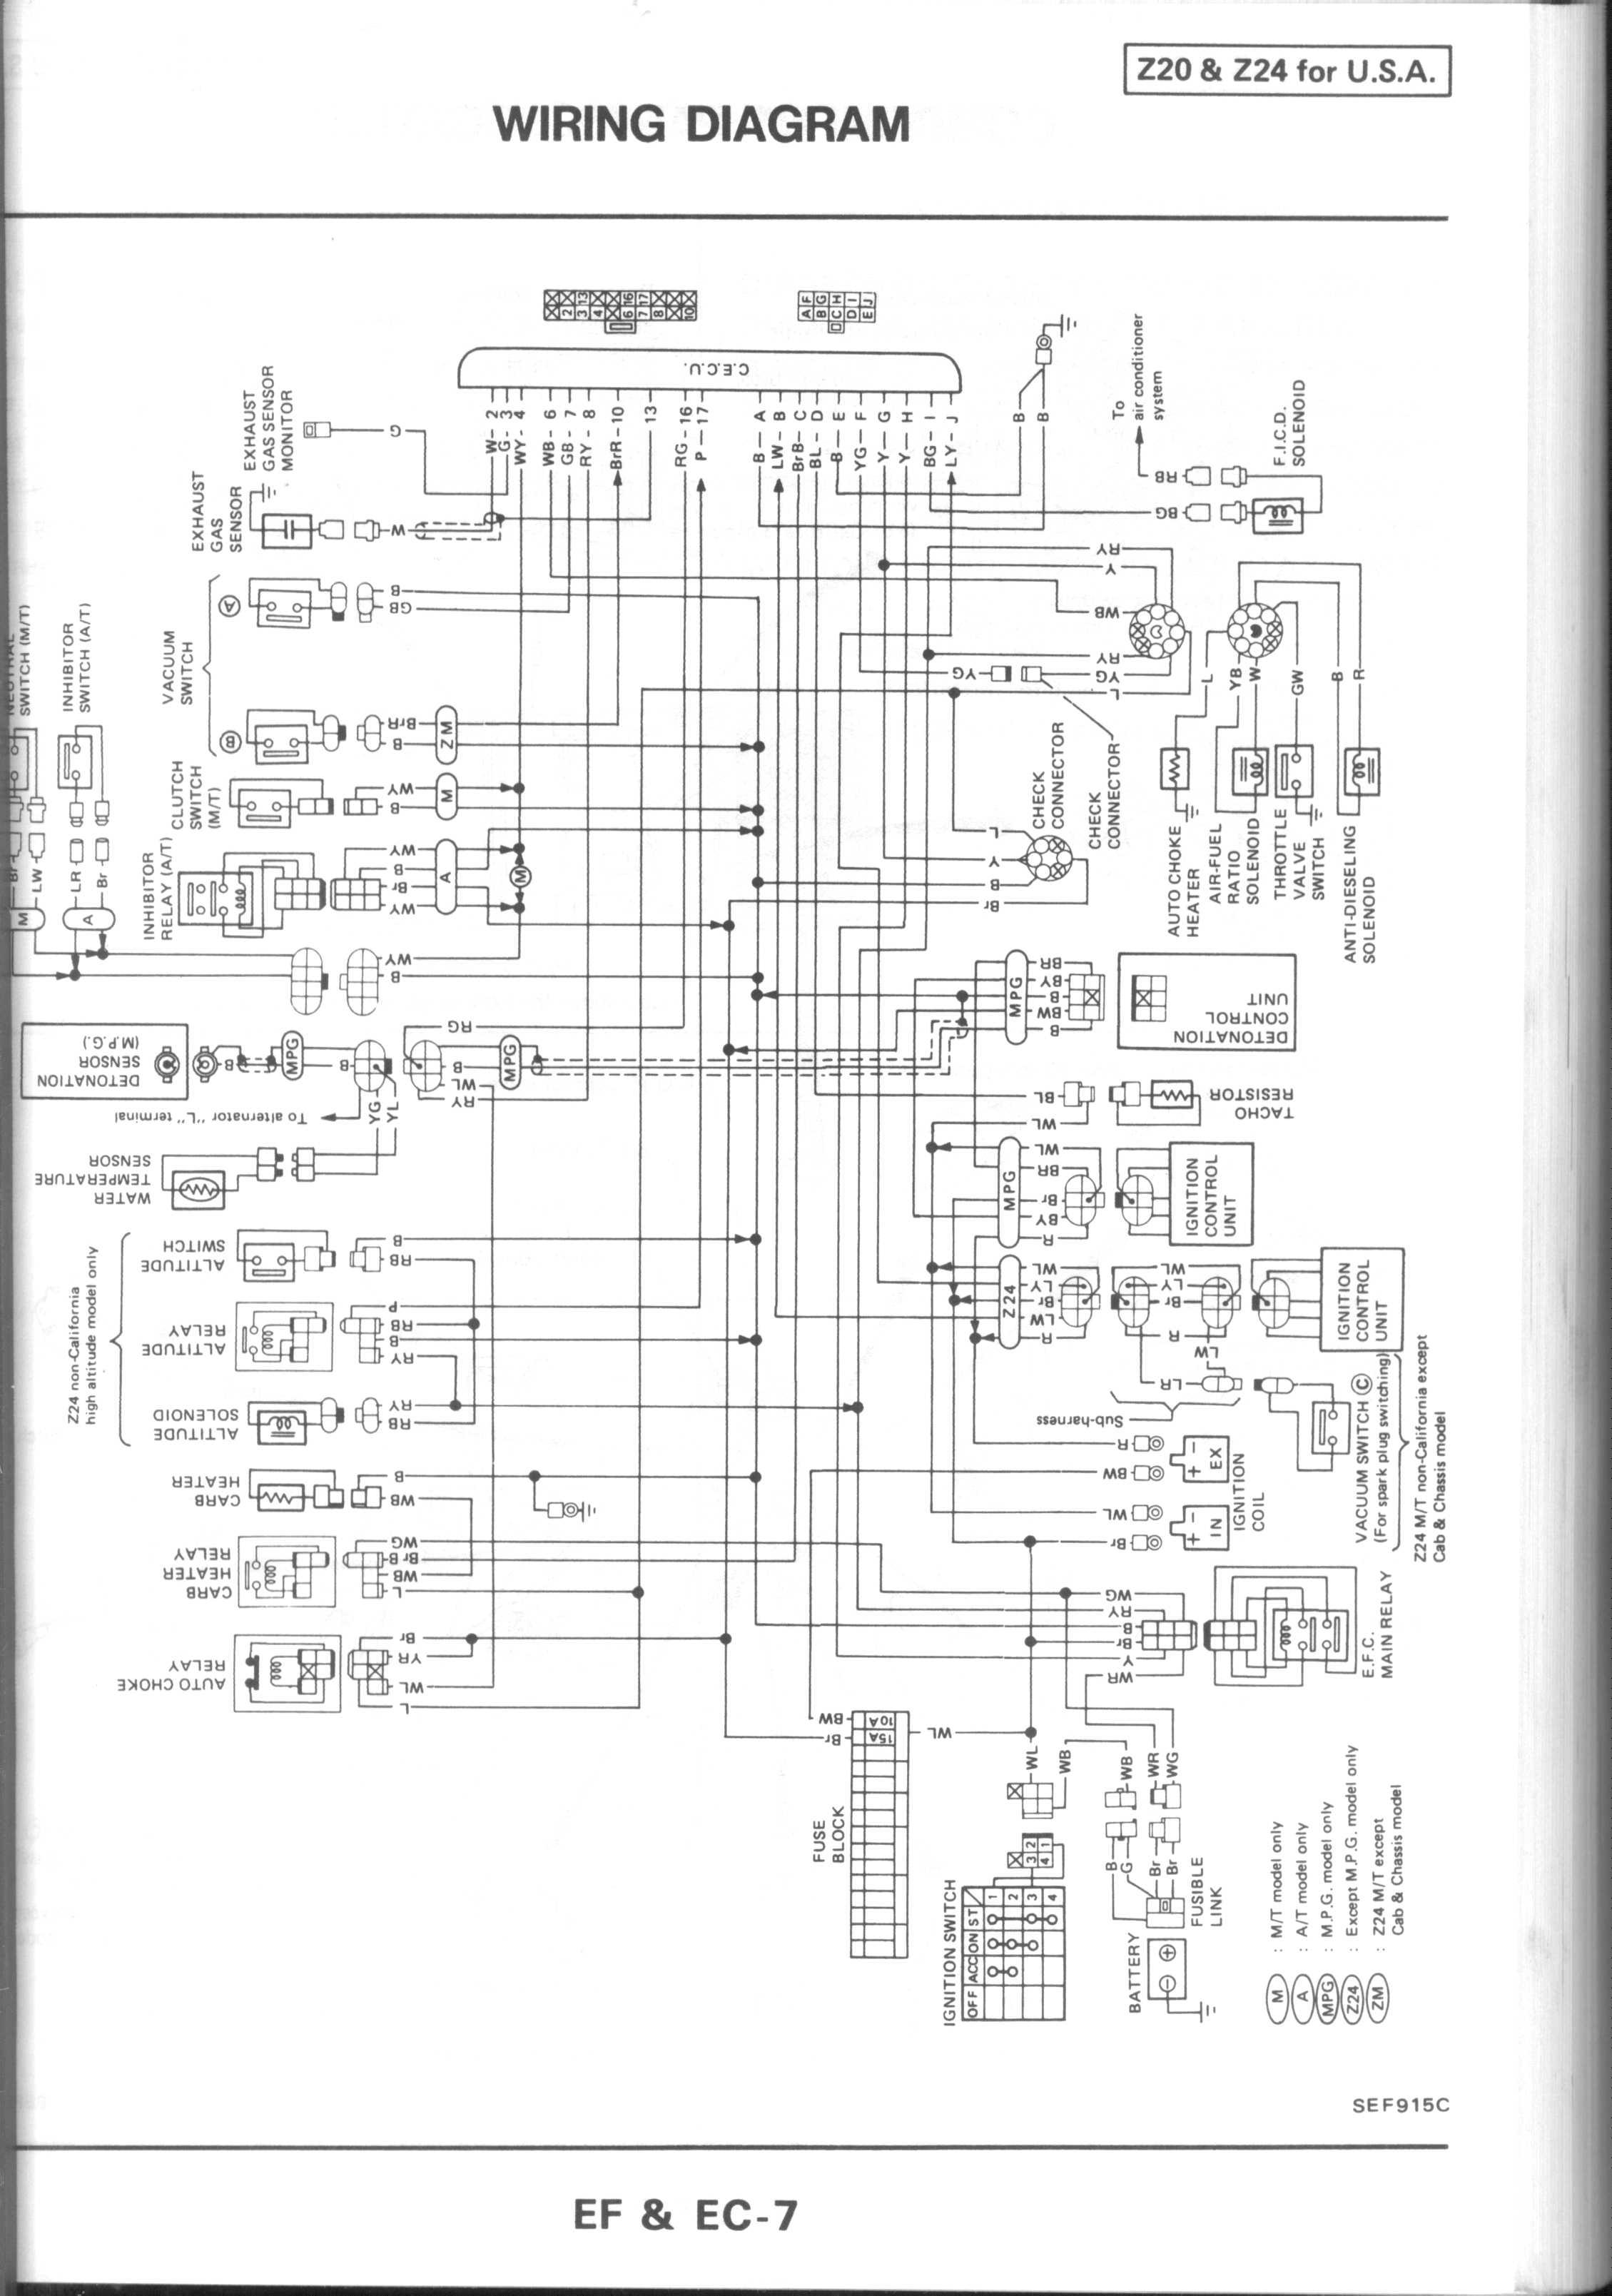 nissan micra k11 ecu wiring diagram nissan image nissan k11 wiring diagram nissan auto wiring diagram schematic on nissan micra k11 ecu wiring